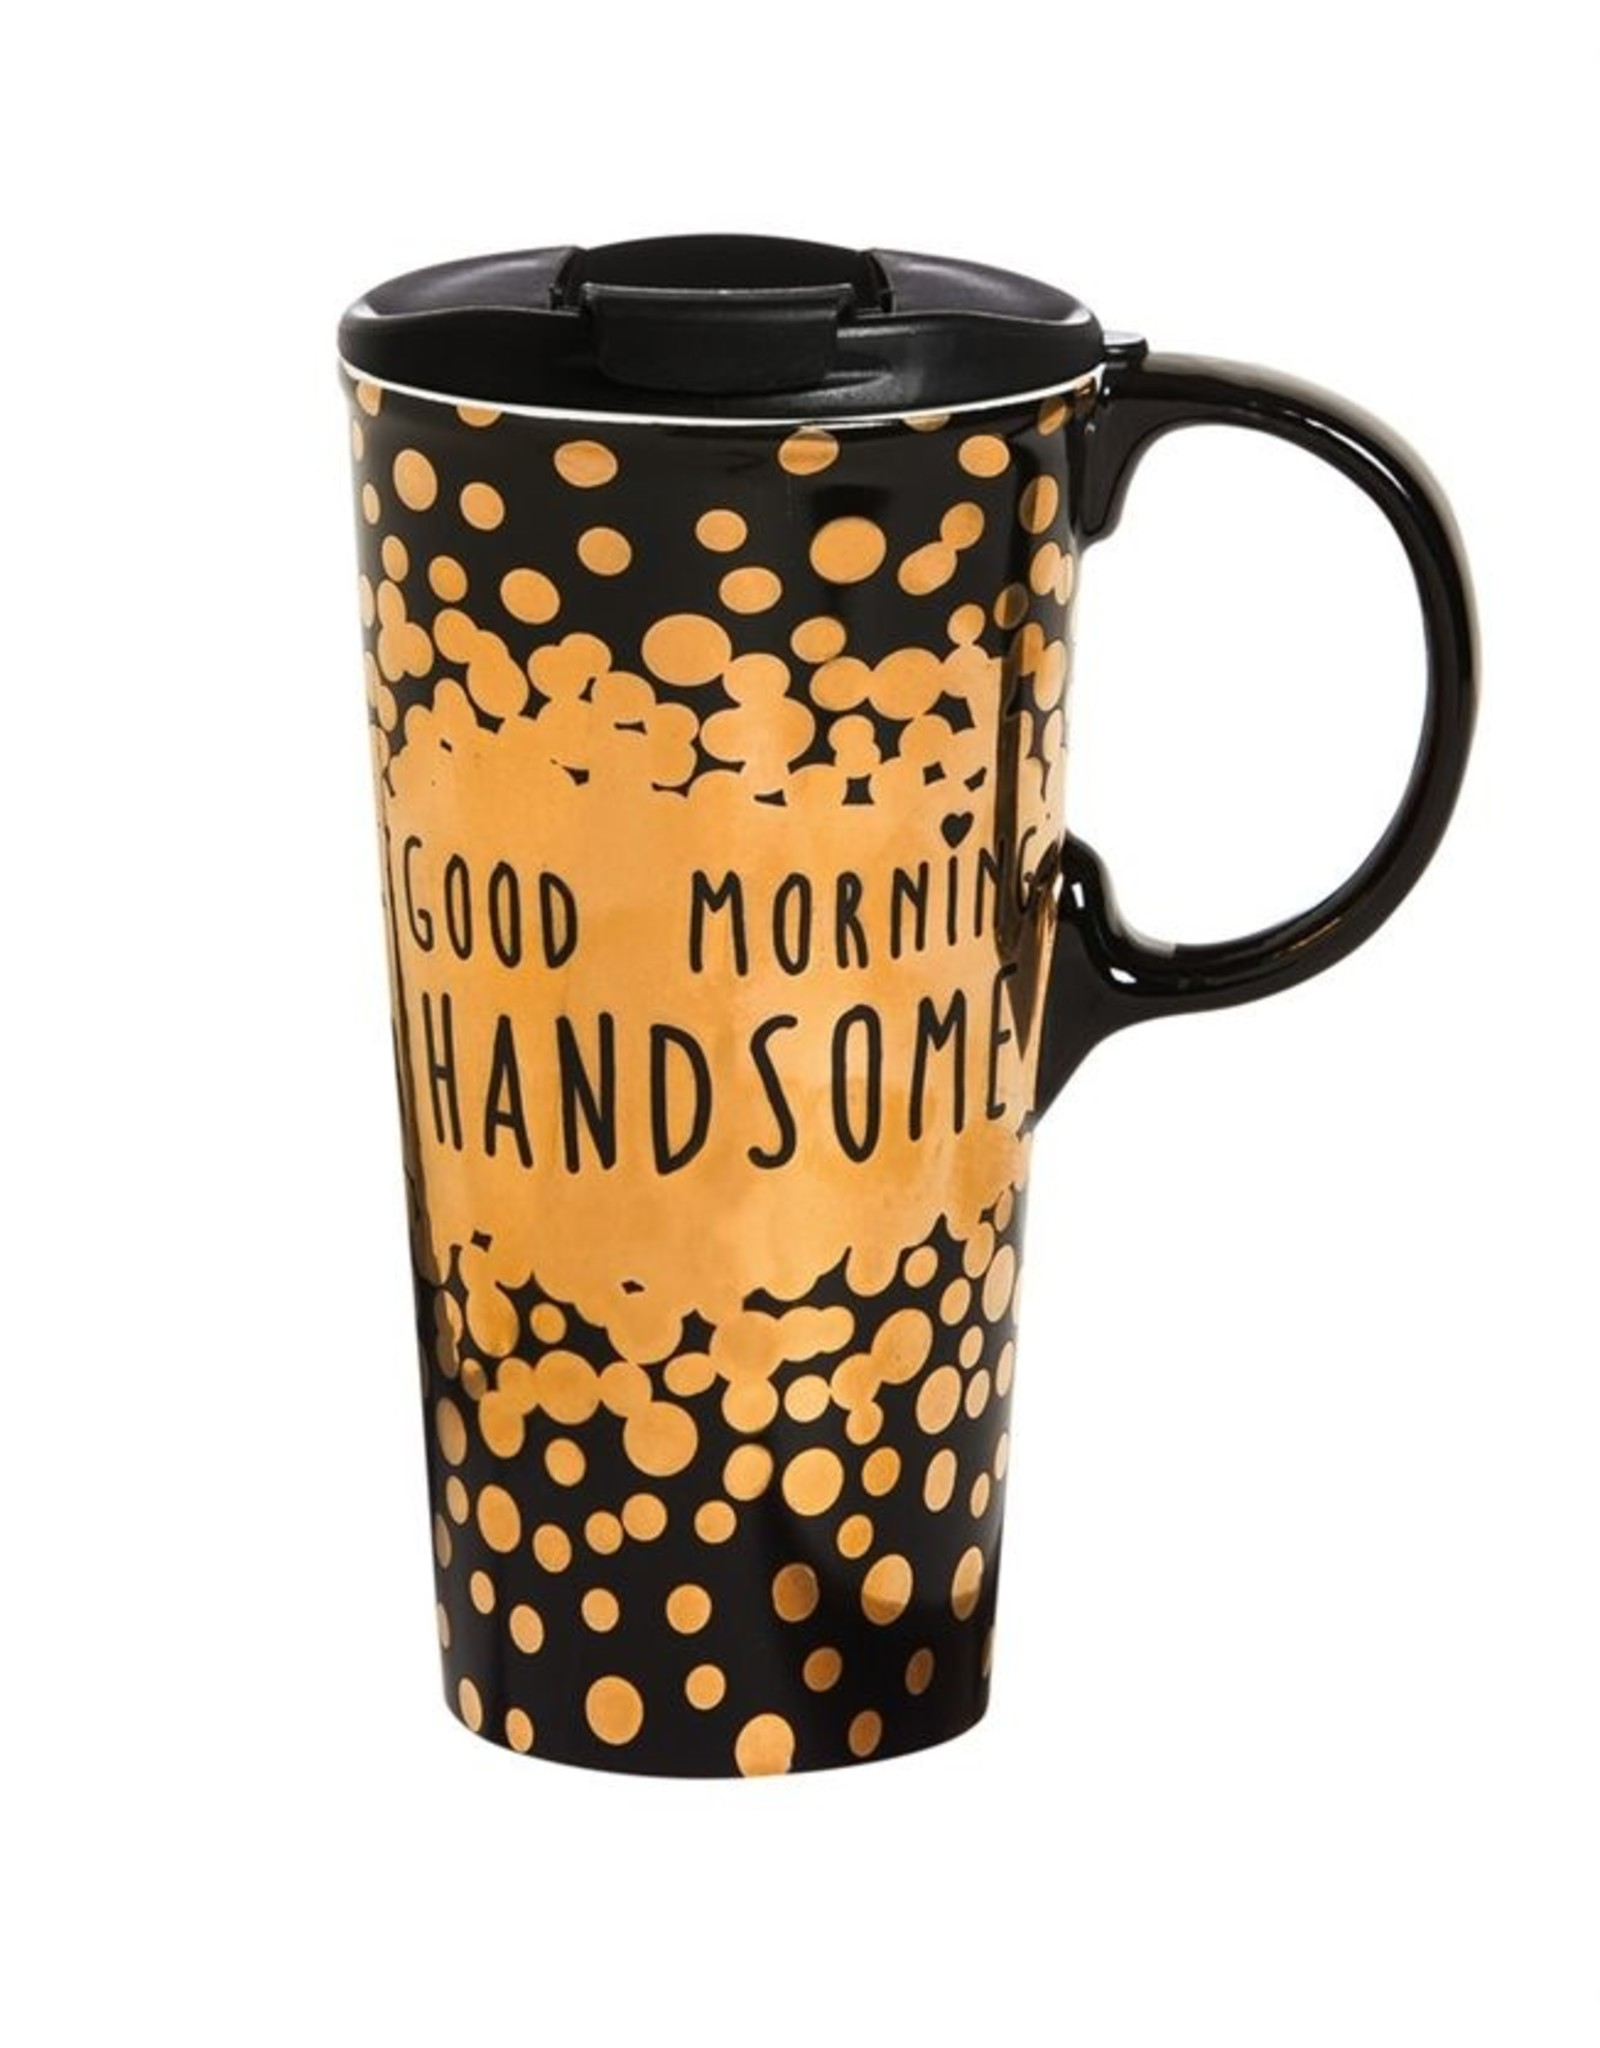 Evergreen Enterprises Good Morning Handsome Ceramic Cup